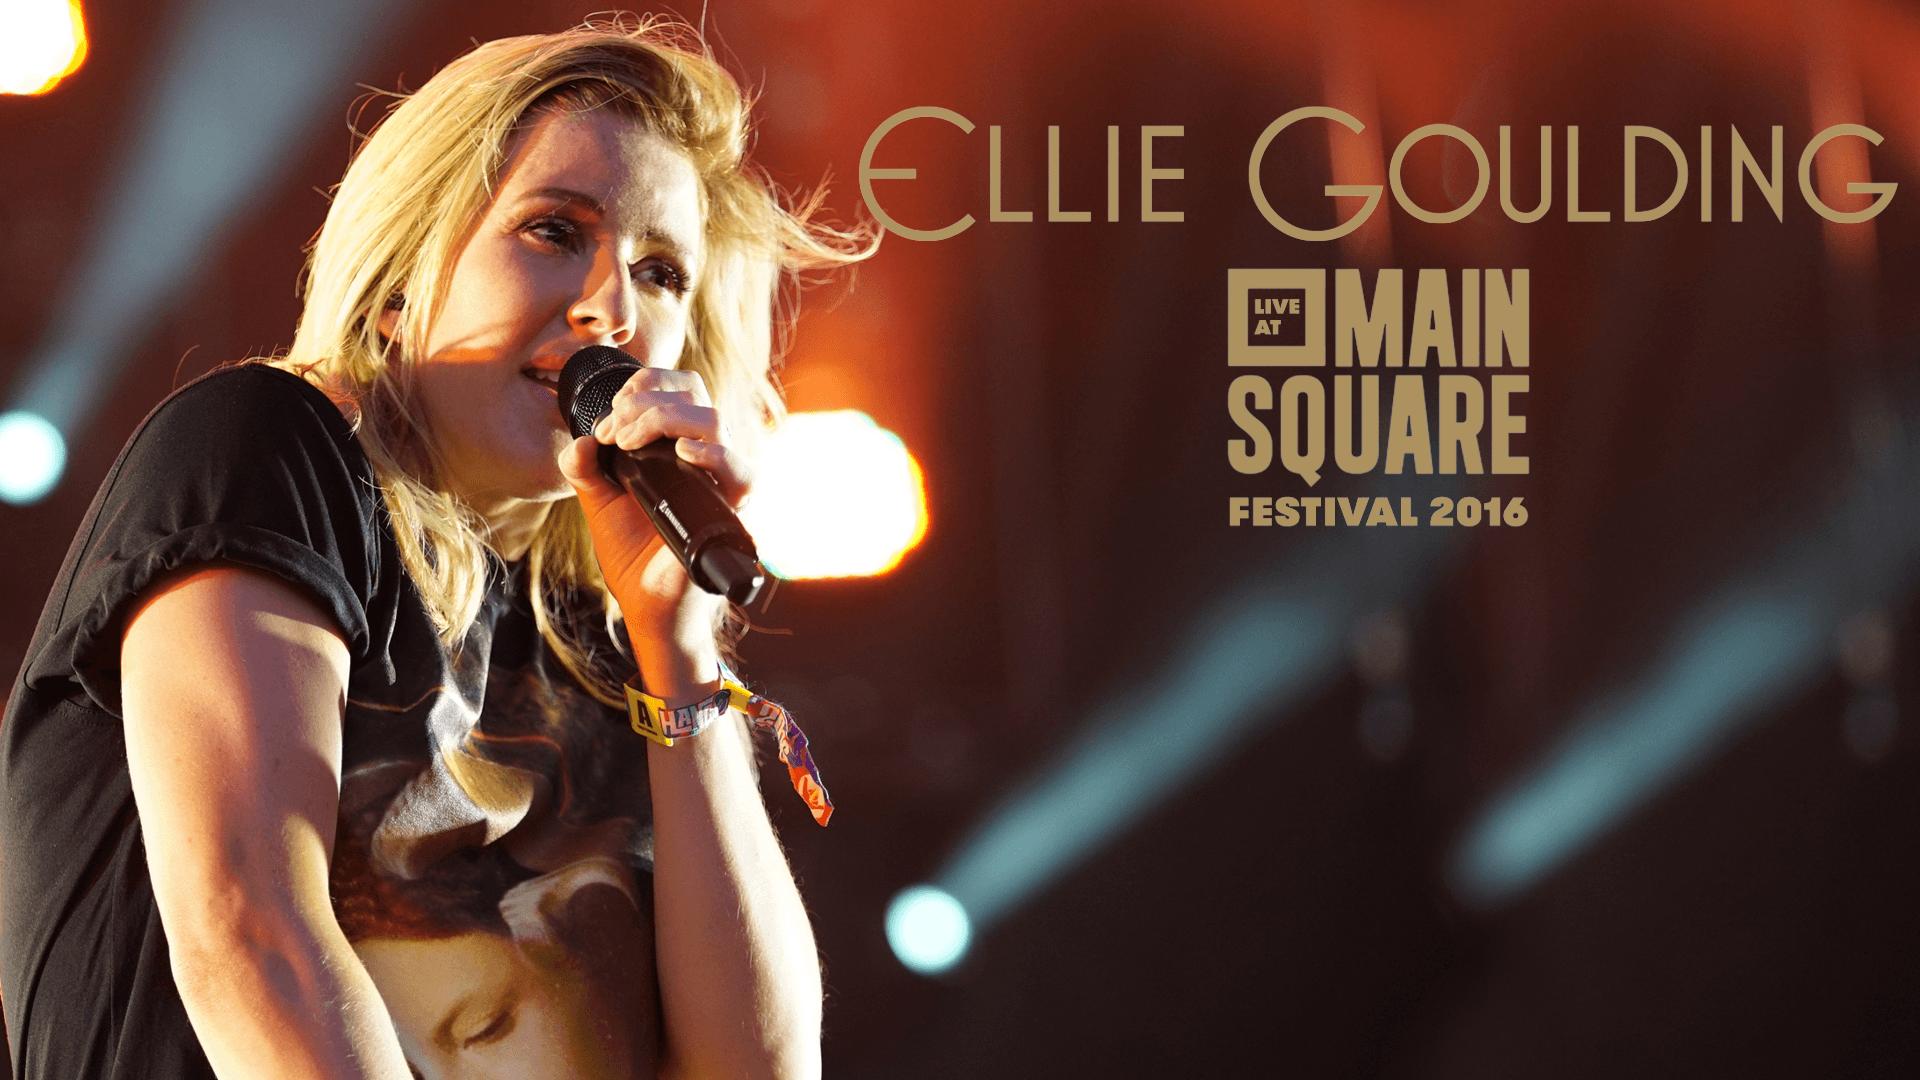 Ellie Goulding: Live at Main Square Festival, 2016